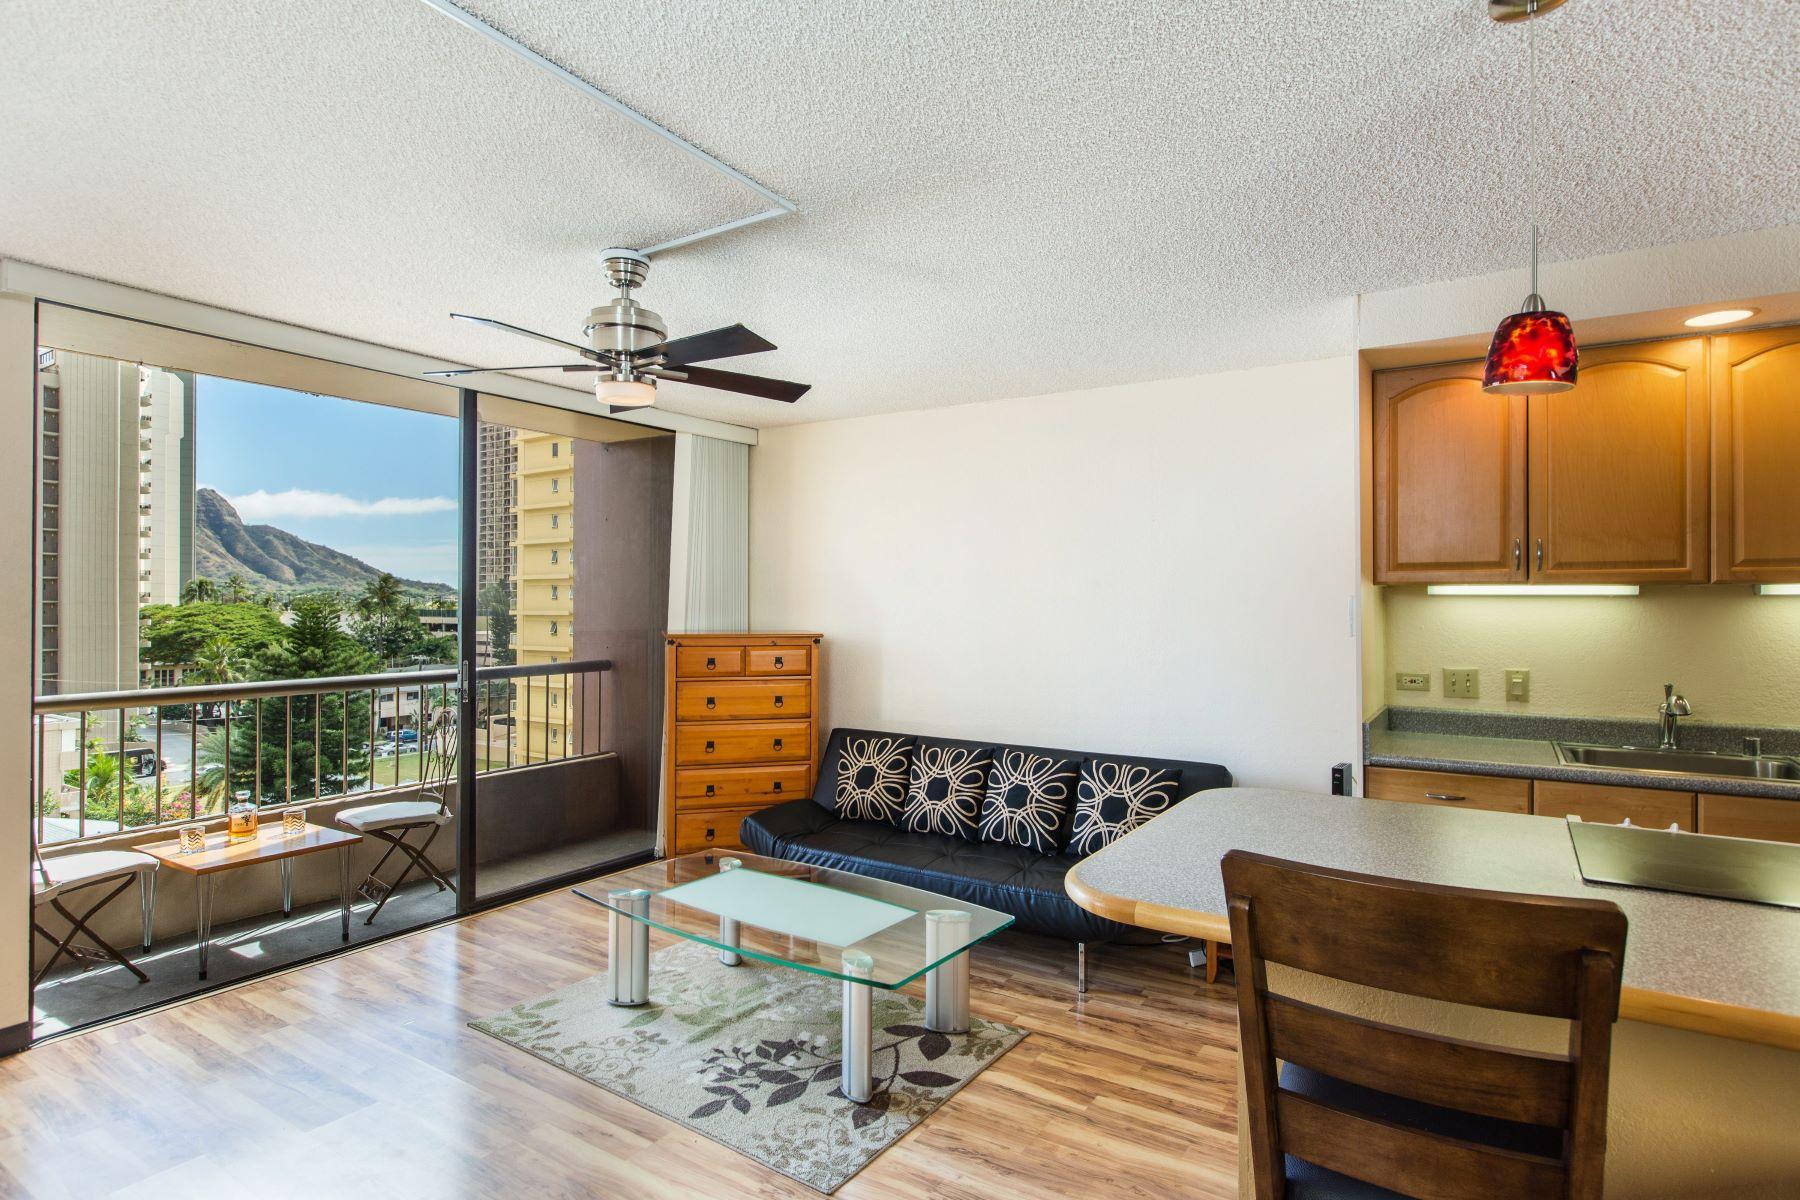 Condominium for Sale at Spectacular Views 320 Liliuokalani Ave #701 Waikiki, Honolulu, Hawaii, 96815 United States